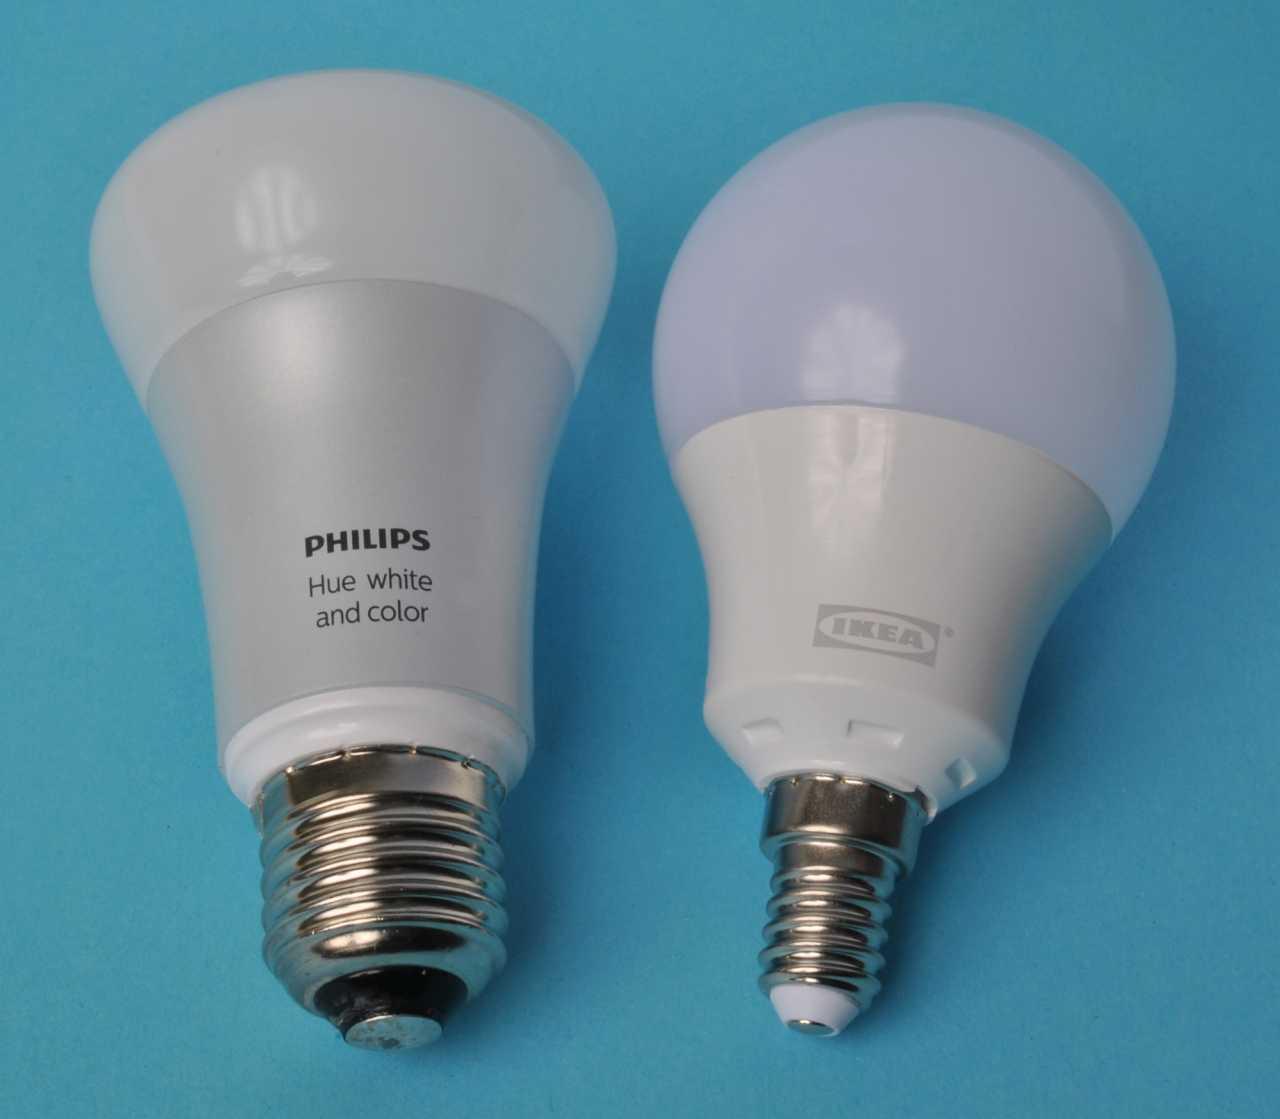 Links eine Philips Hue white and color, rechts eine Ikea Tradfri Lampe